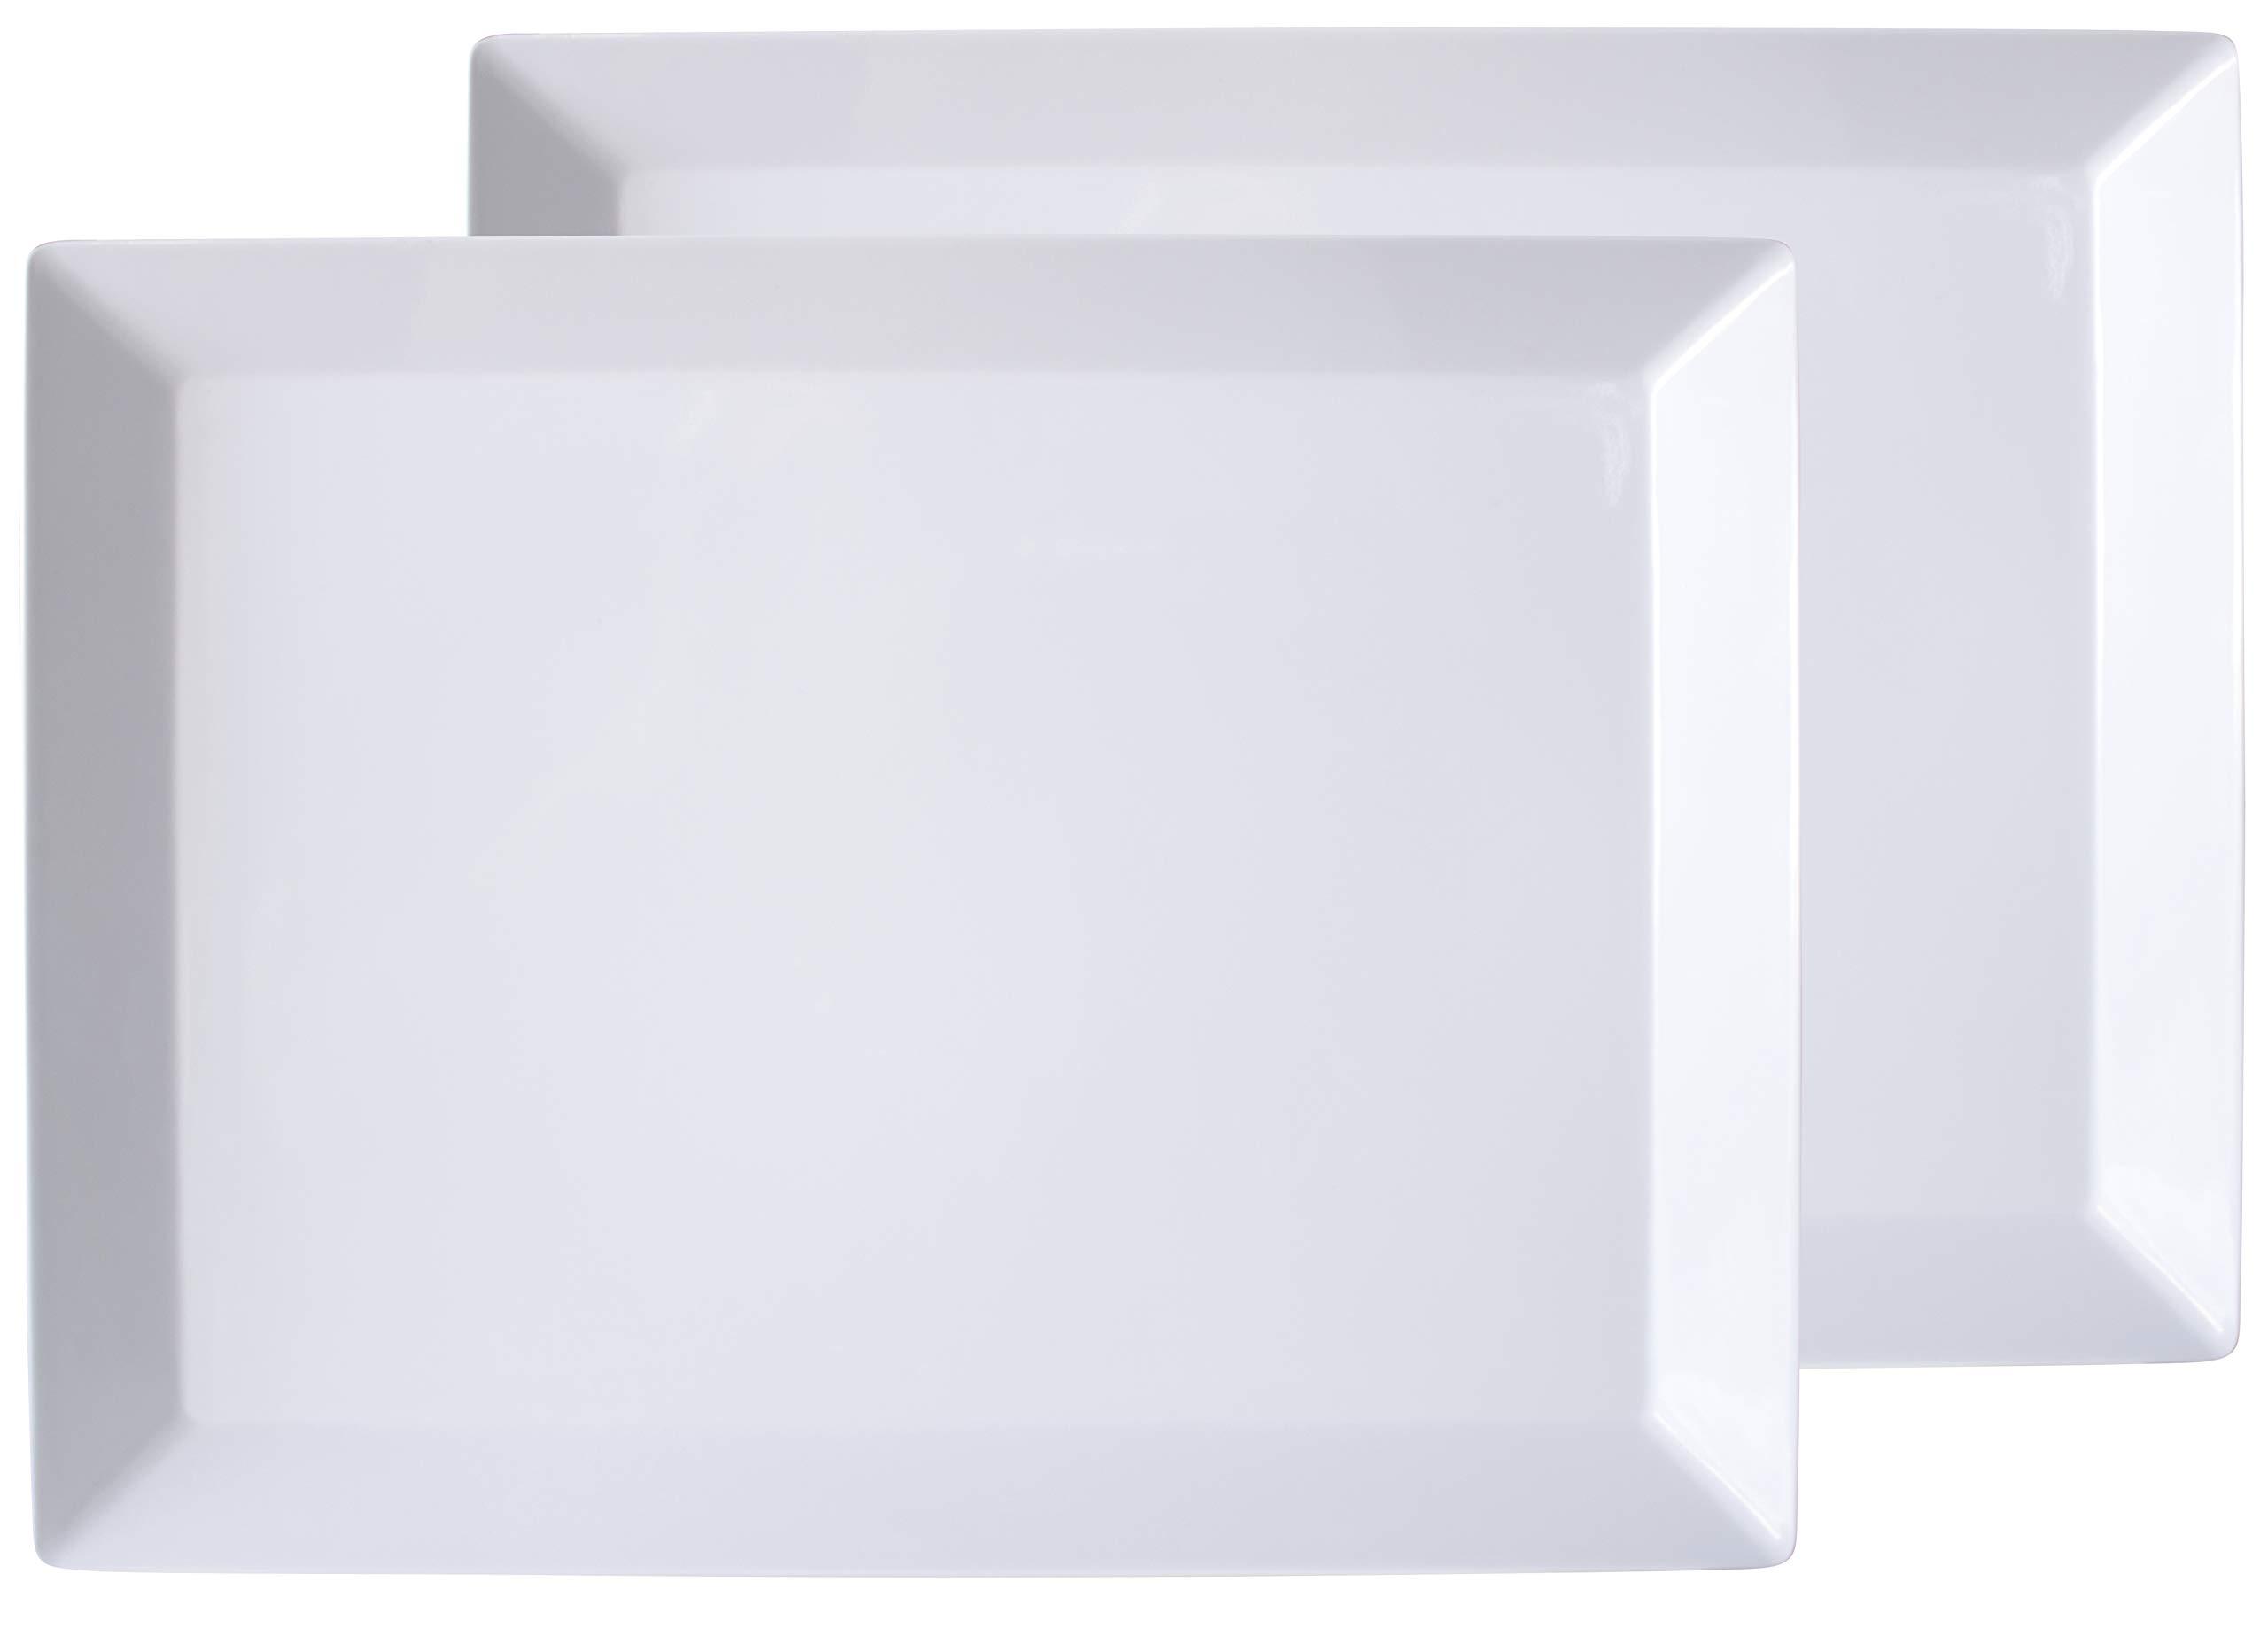 Virtual Elements Set of 2 Melamine Rectangular Serving Trays/Platters - White 18'' x 13.7''